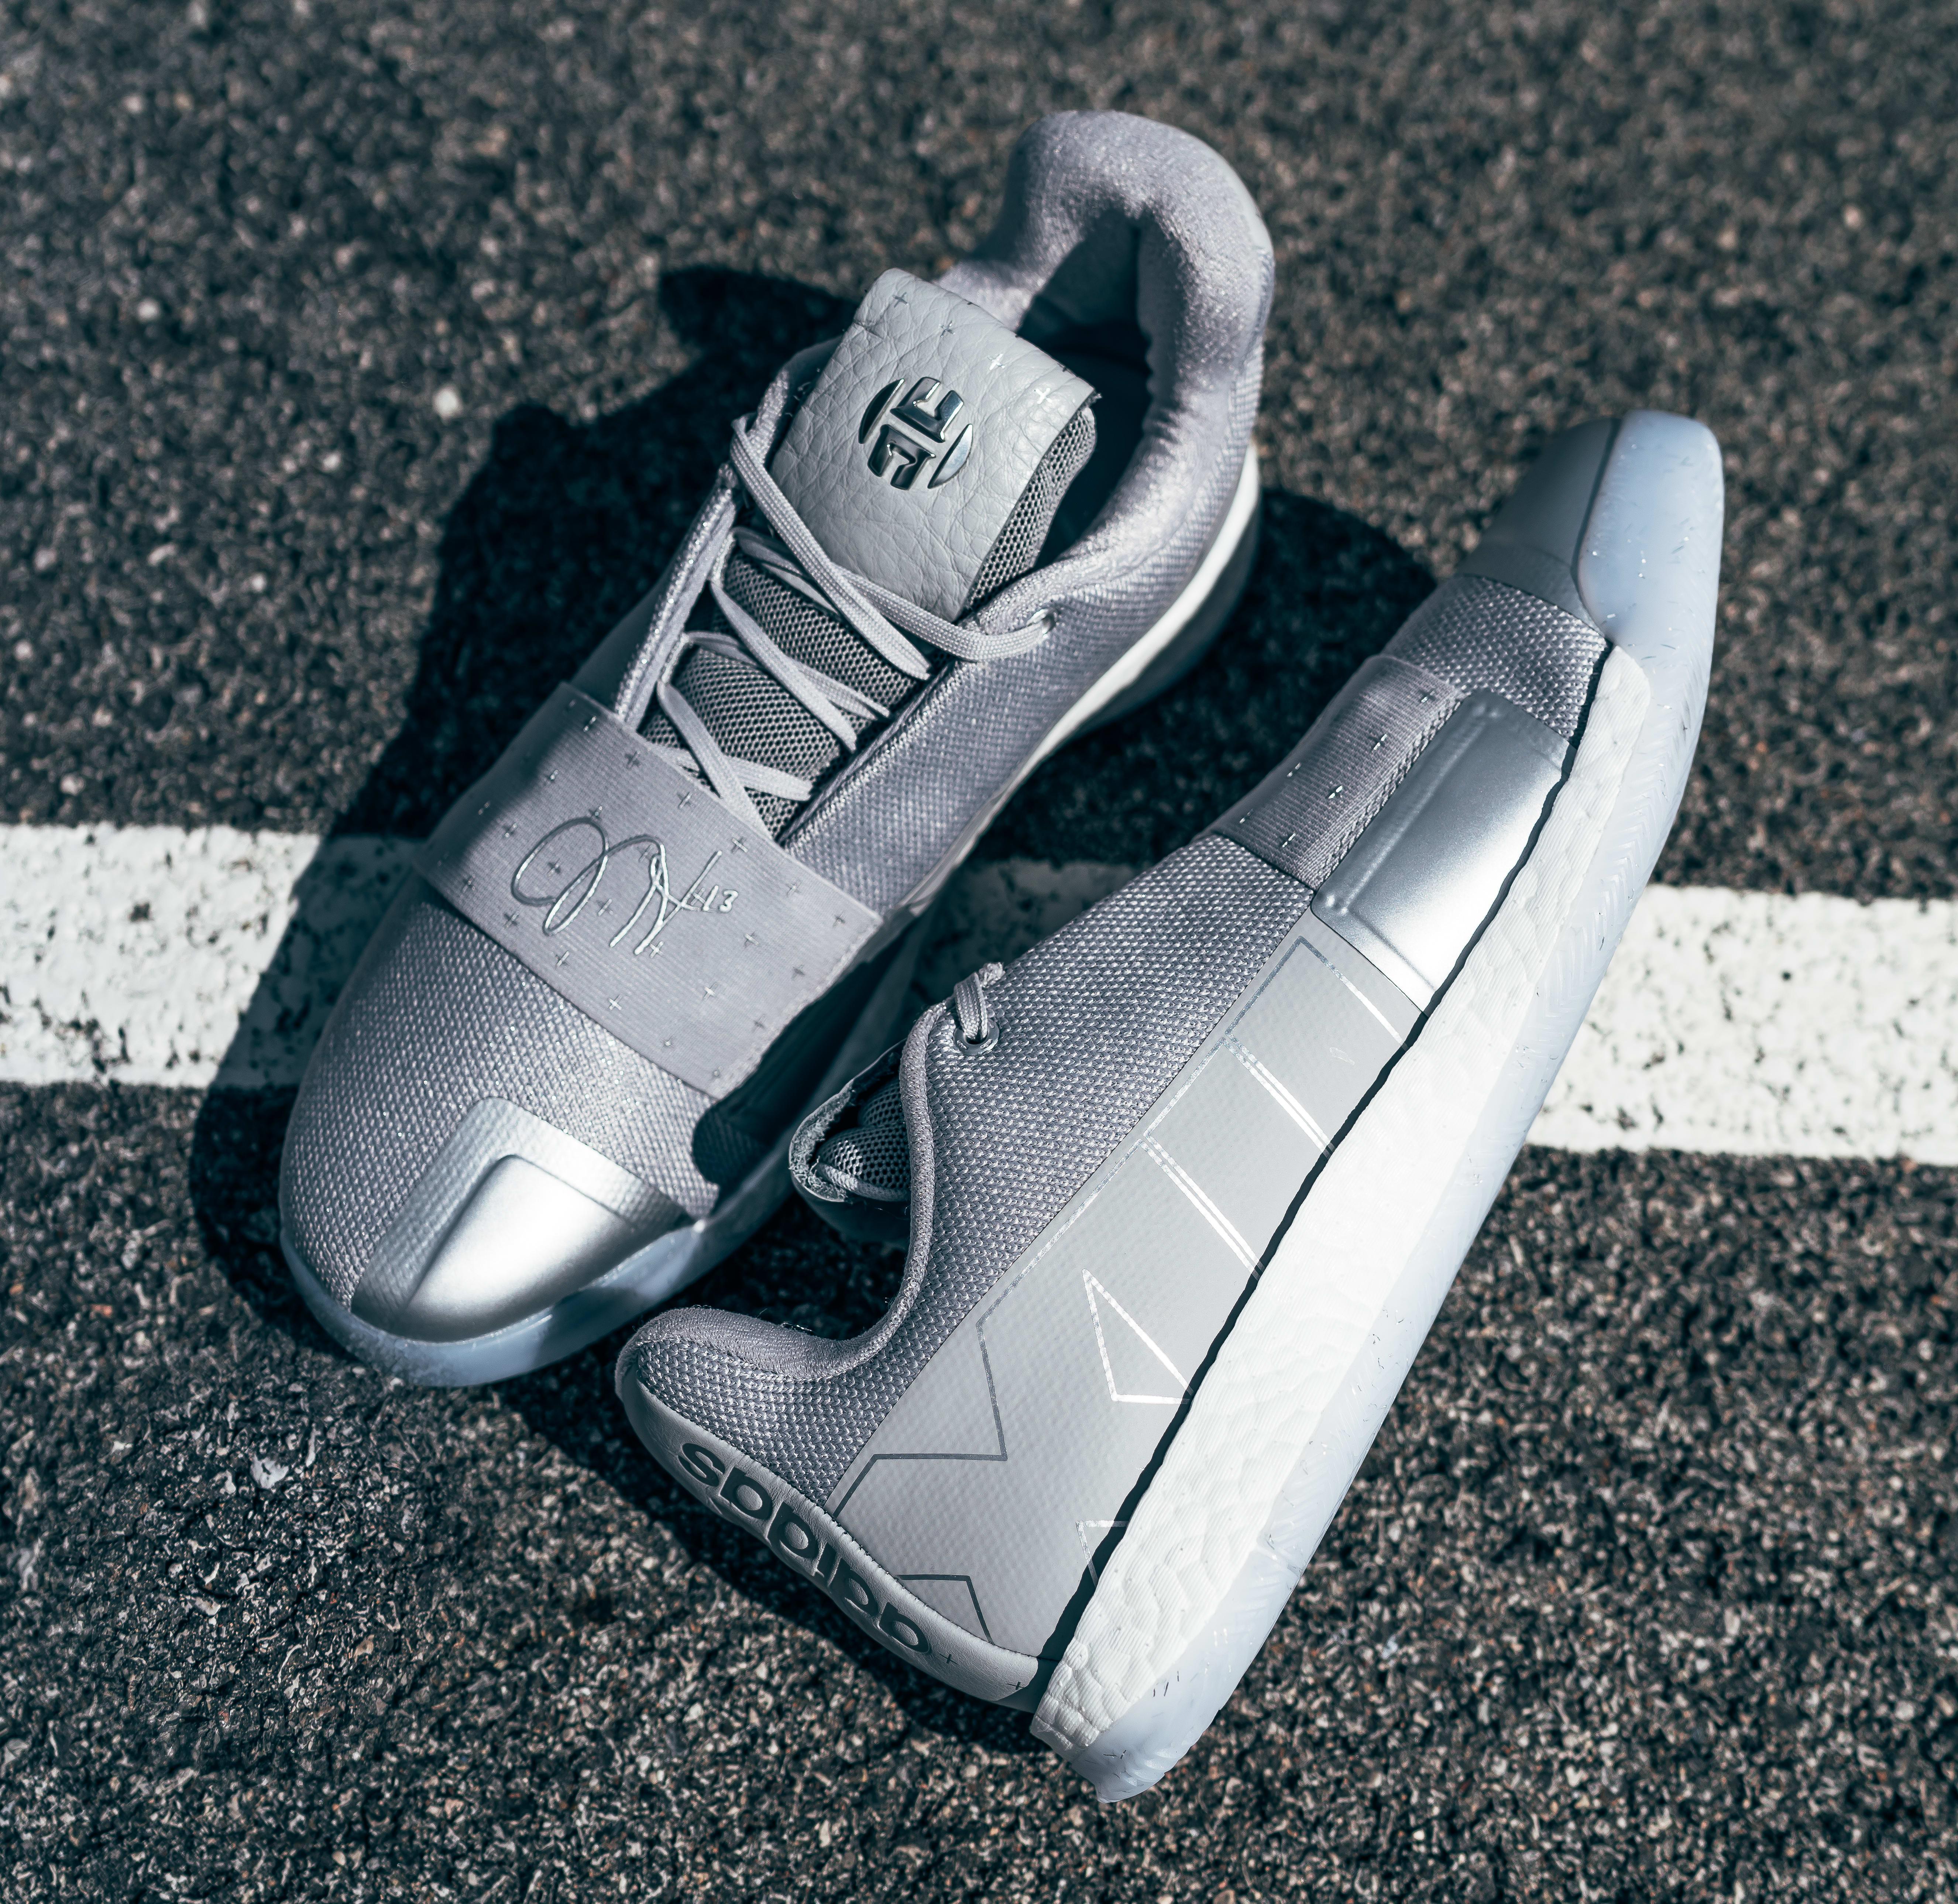 Adidas Harden Vol. 3 'Voyager' (Pair)